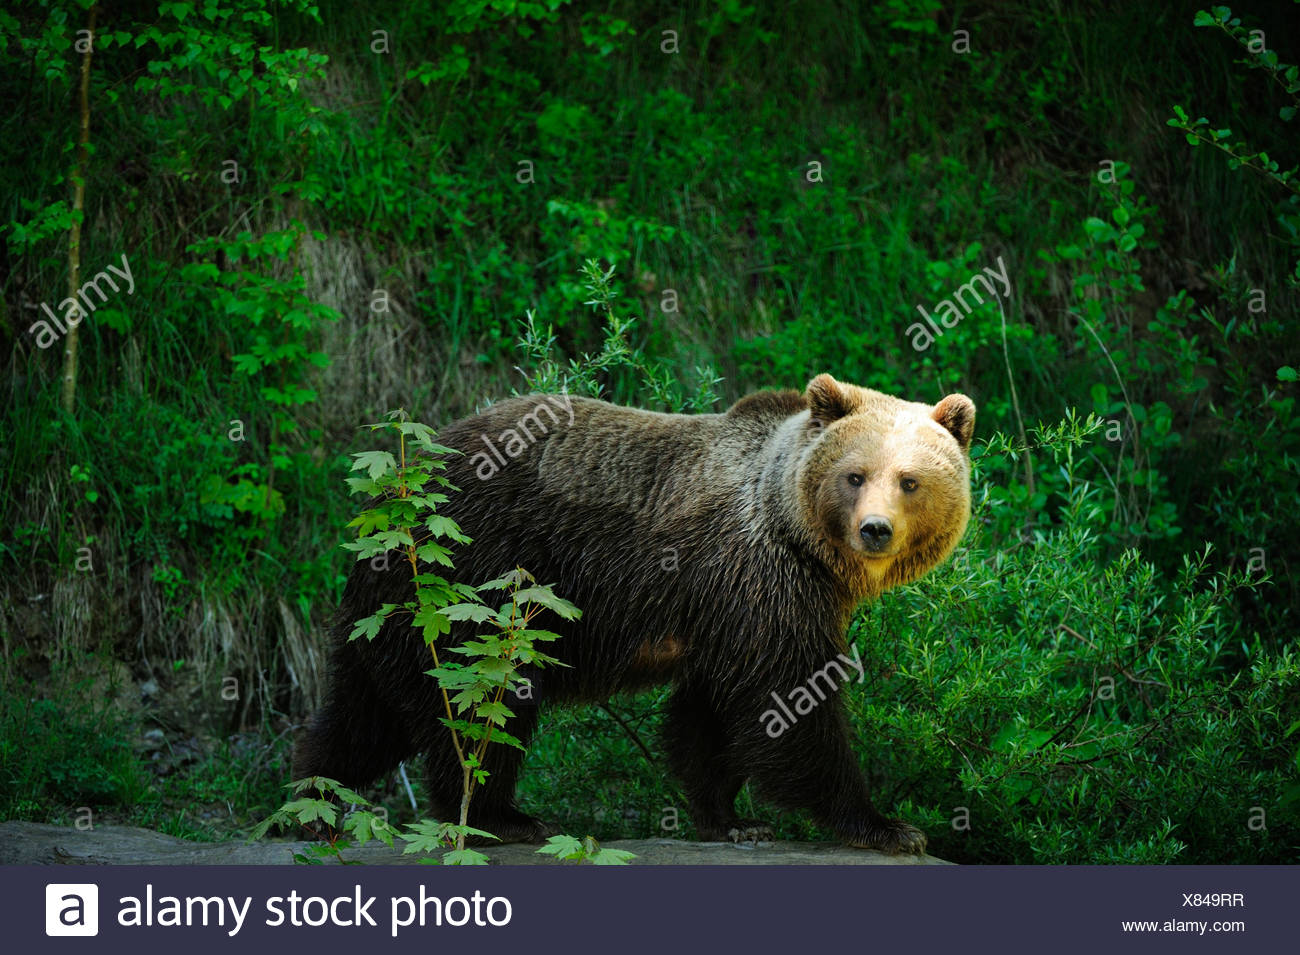 Ours brun (Ursus arctos), Zoo Langenberg, Adliswil, Canton de Zurich, Suisse Photo Stock